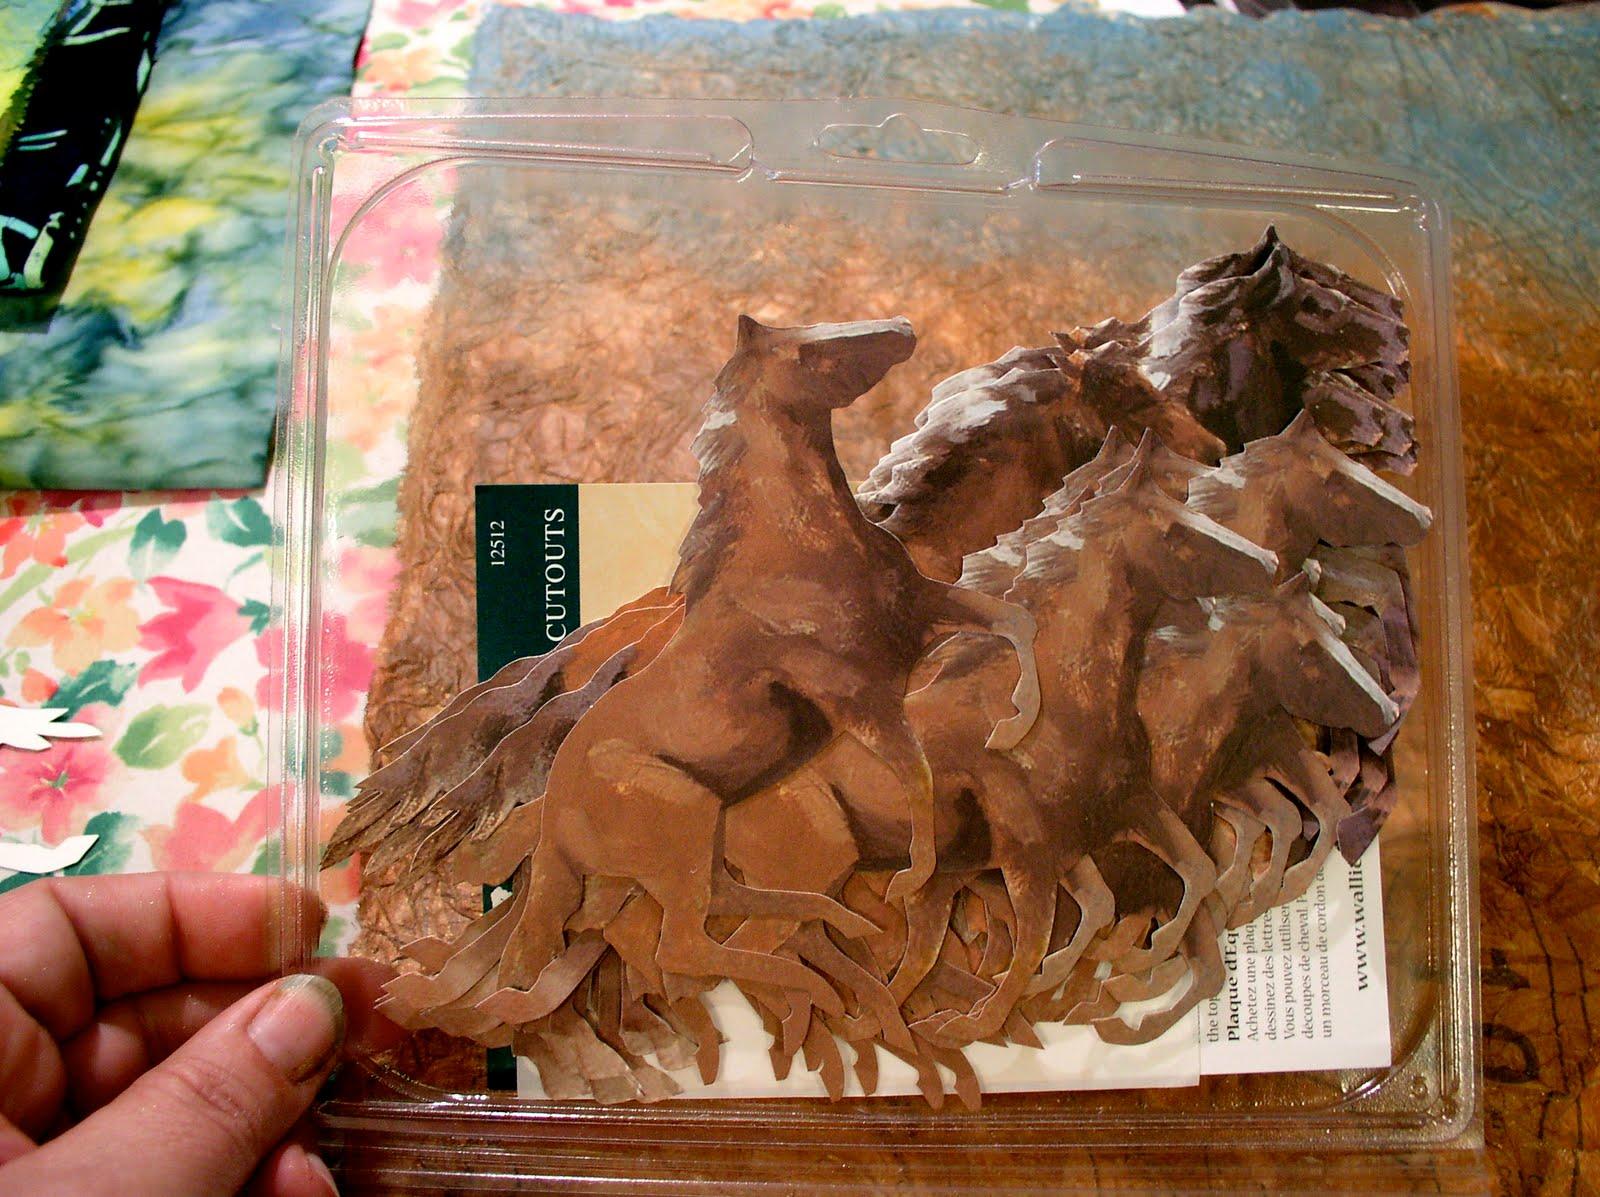 http://1.bp.blogspot.com/_2ssunQr1FDY/SwxKMaVlPWI/AAAAAAAADP8/4Mu5FJToTAs/s1600/Fabric+Paper+Horses+Wallpaper+2.jpg